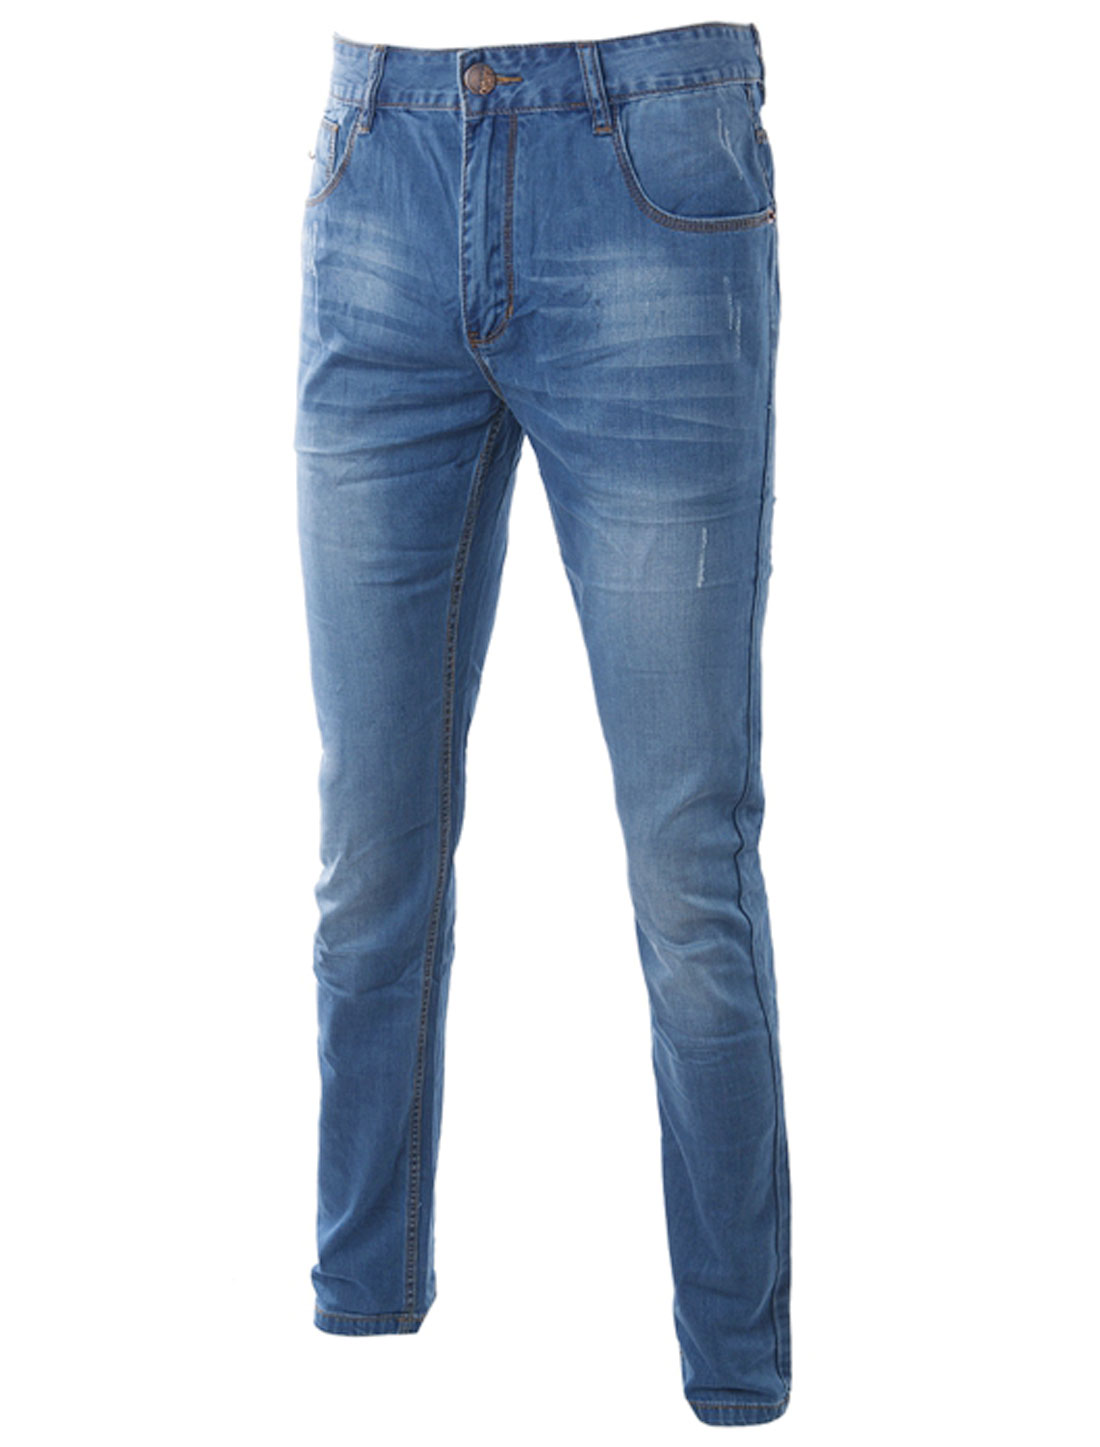 Hip Pockets Zip Fly Belt Loop Denim Pants for Man Sky Blue W34